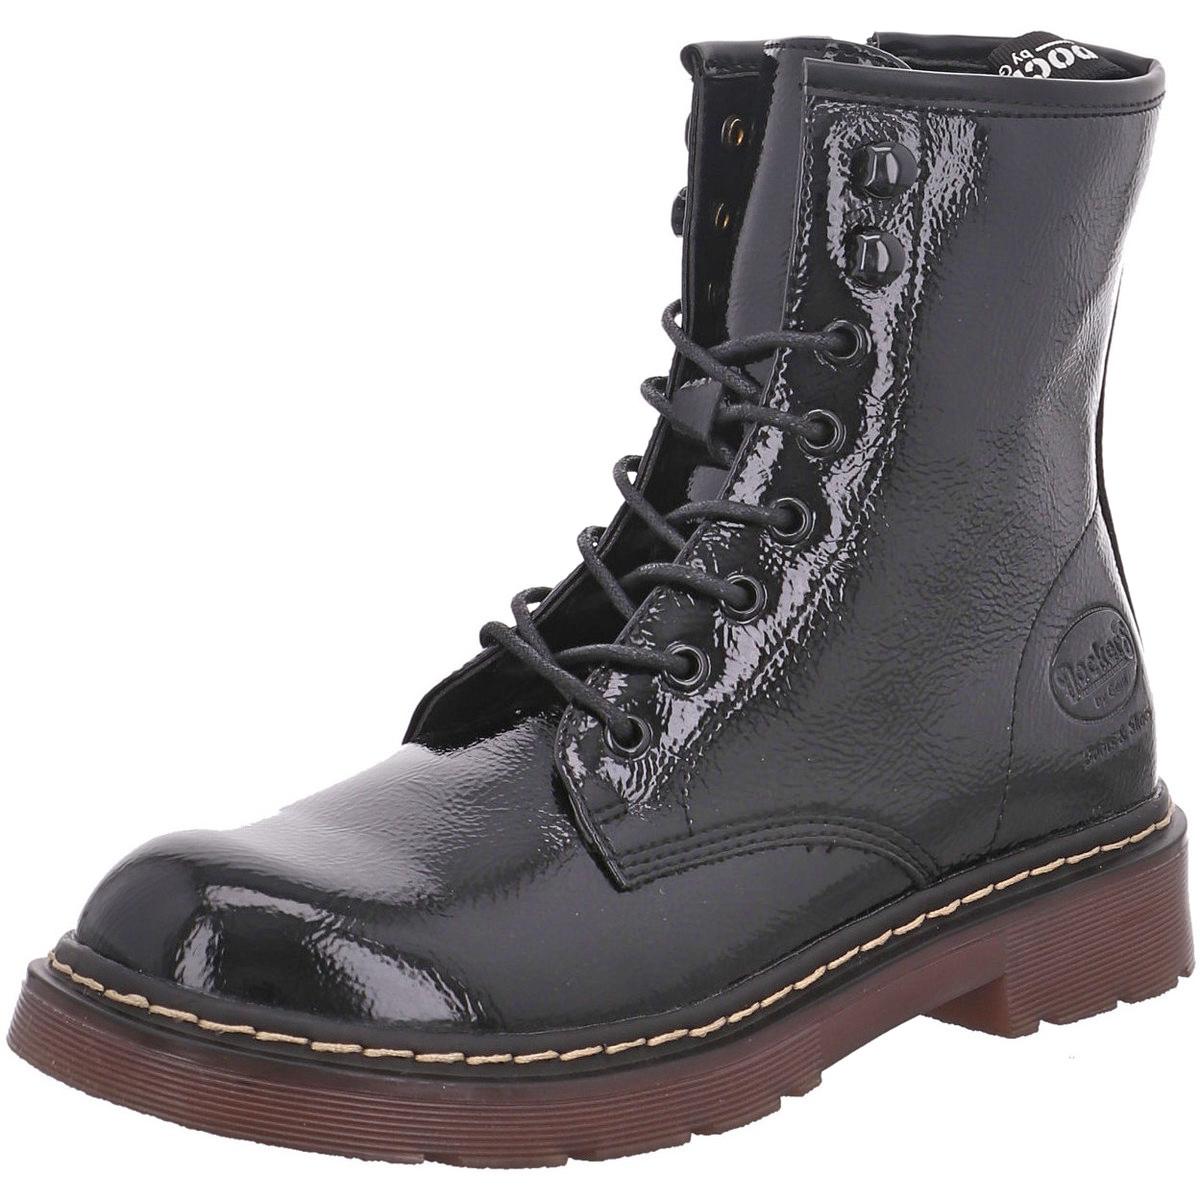 Stiefel 45ts201 Dockers Zu By Combat Dessert Boots Damen Details Schwarz Gerli Lack Ok8n0NwPX